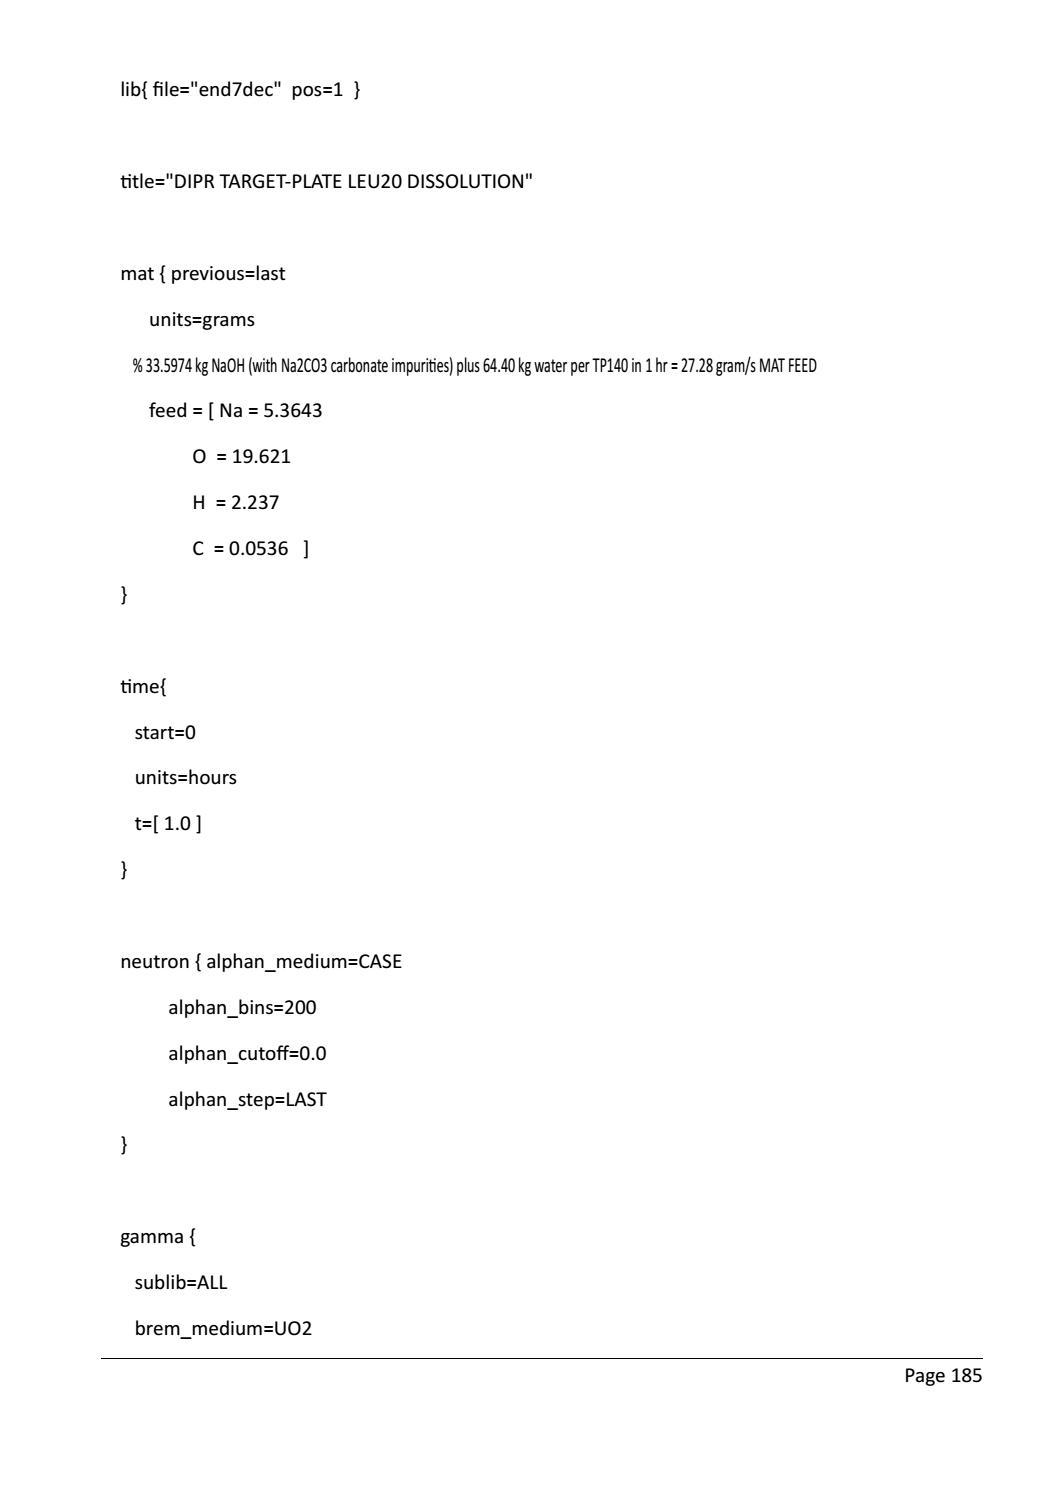 RADIOACTIVE WASTE: COMPUTATIONAL CHARACTERISATION and SHIELDING page 210